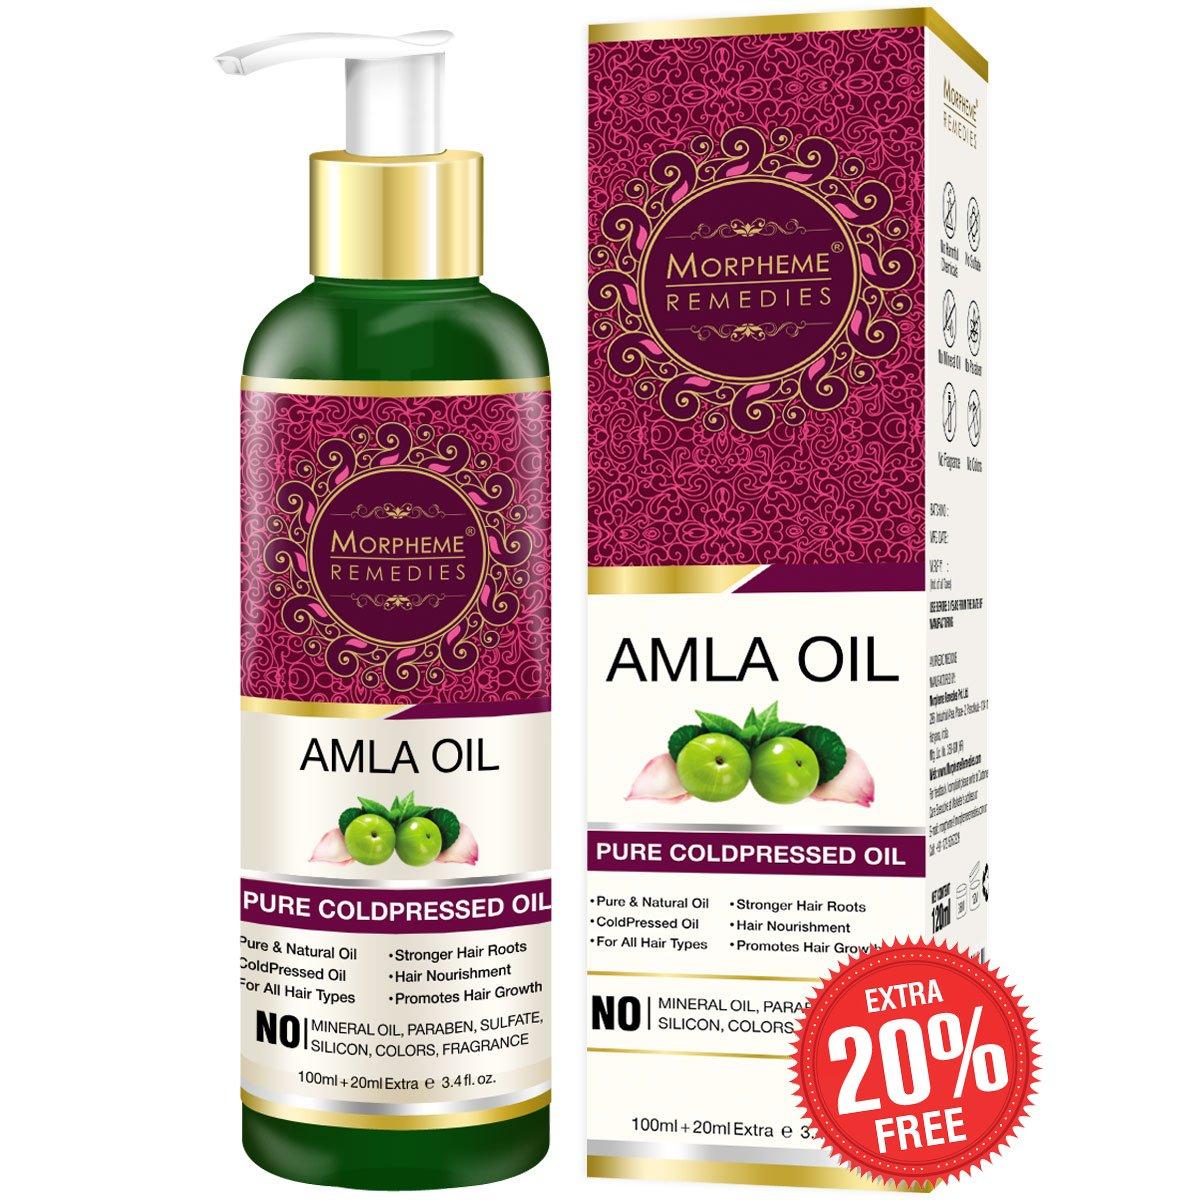 Morpheme Remedies Pure Amla Oil, 120 ml product image